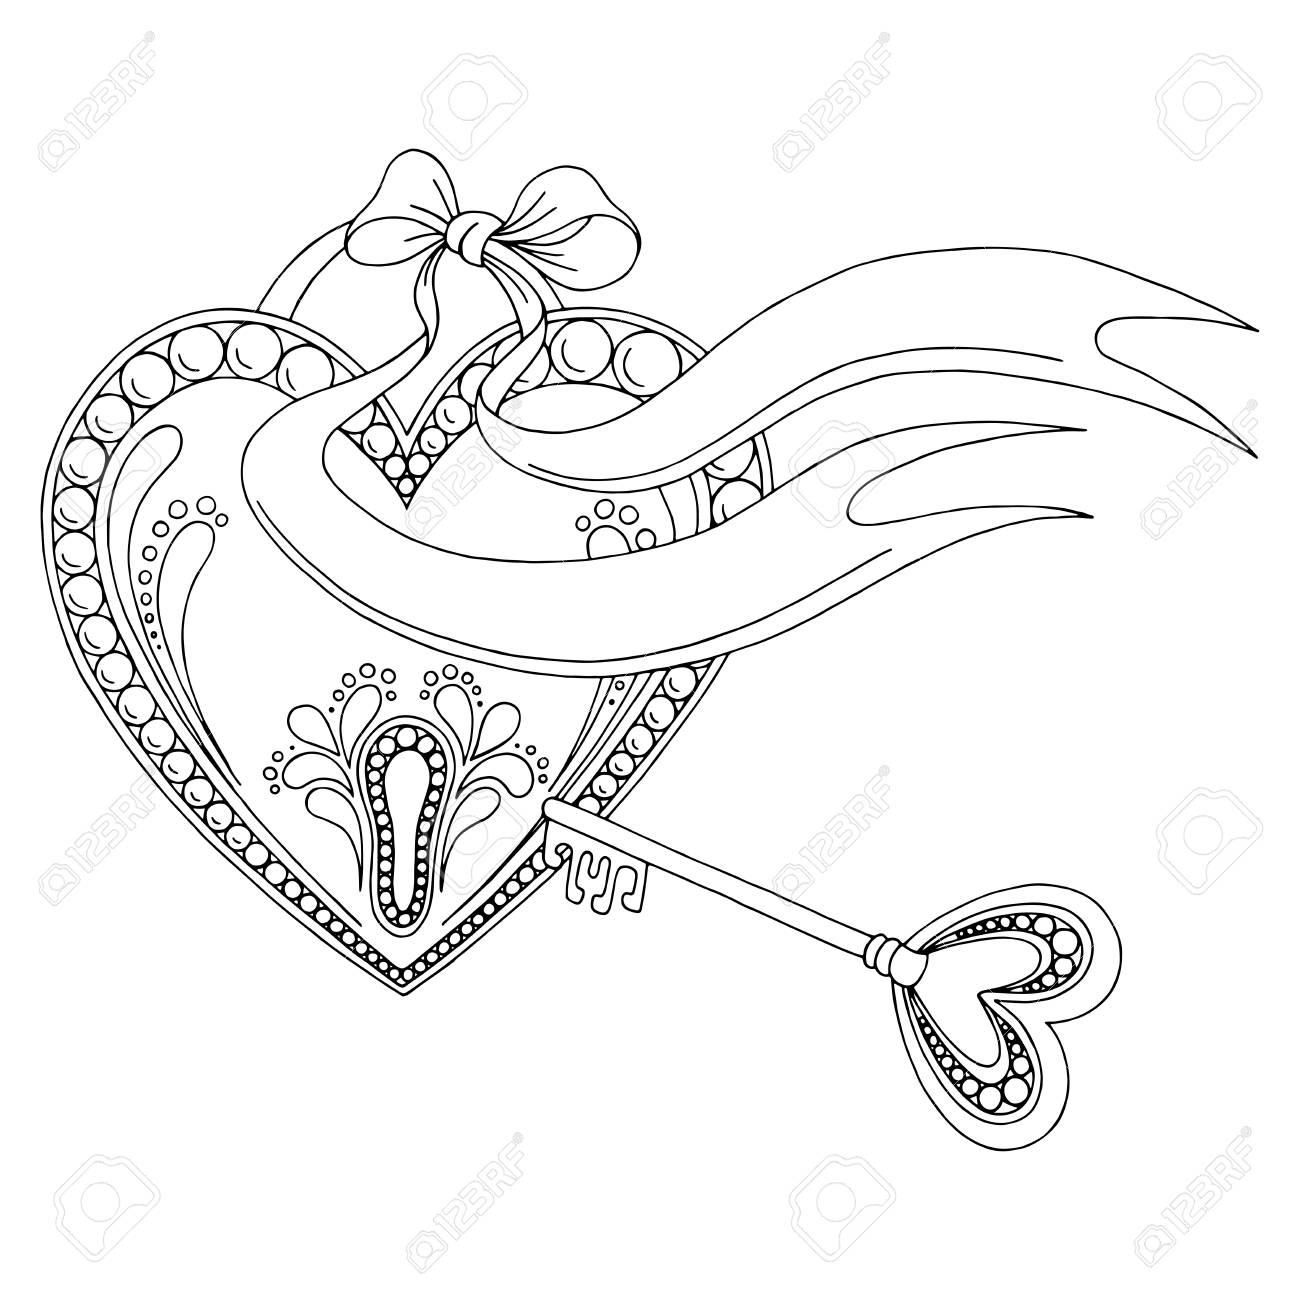 1300x1300 Pattern Heart Lock Key Doodle Black White Graphic Sketch